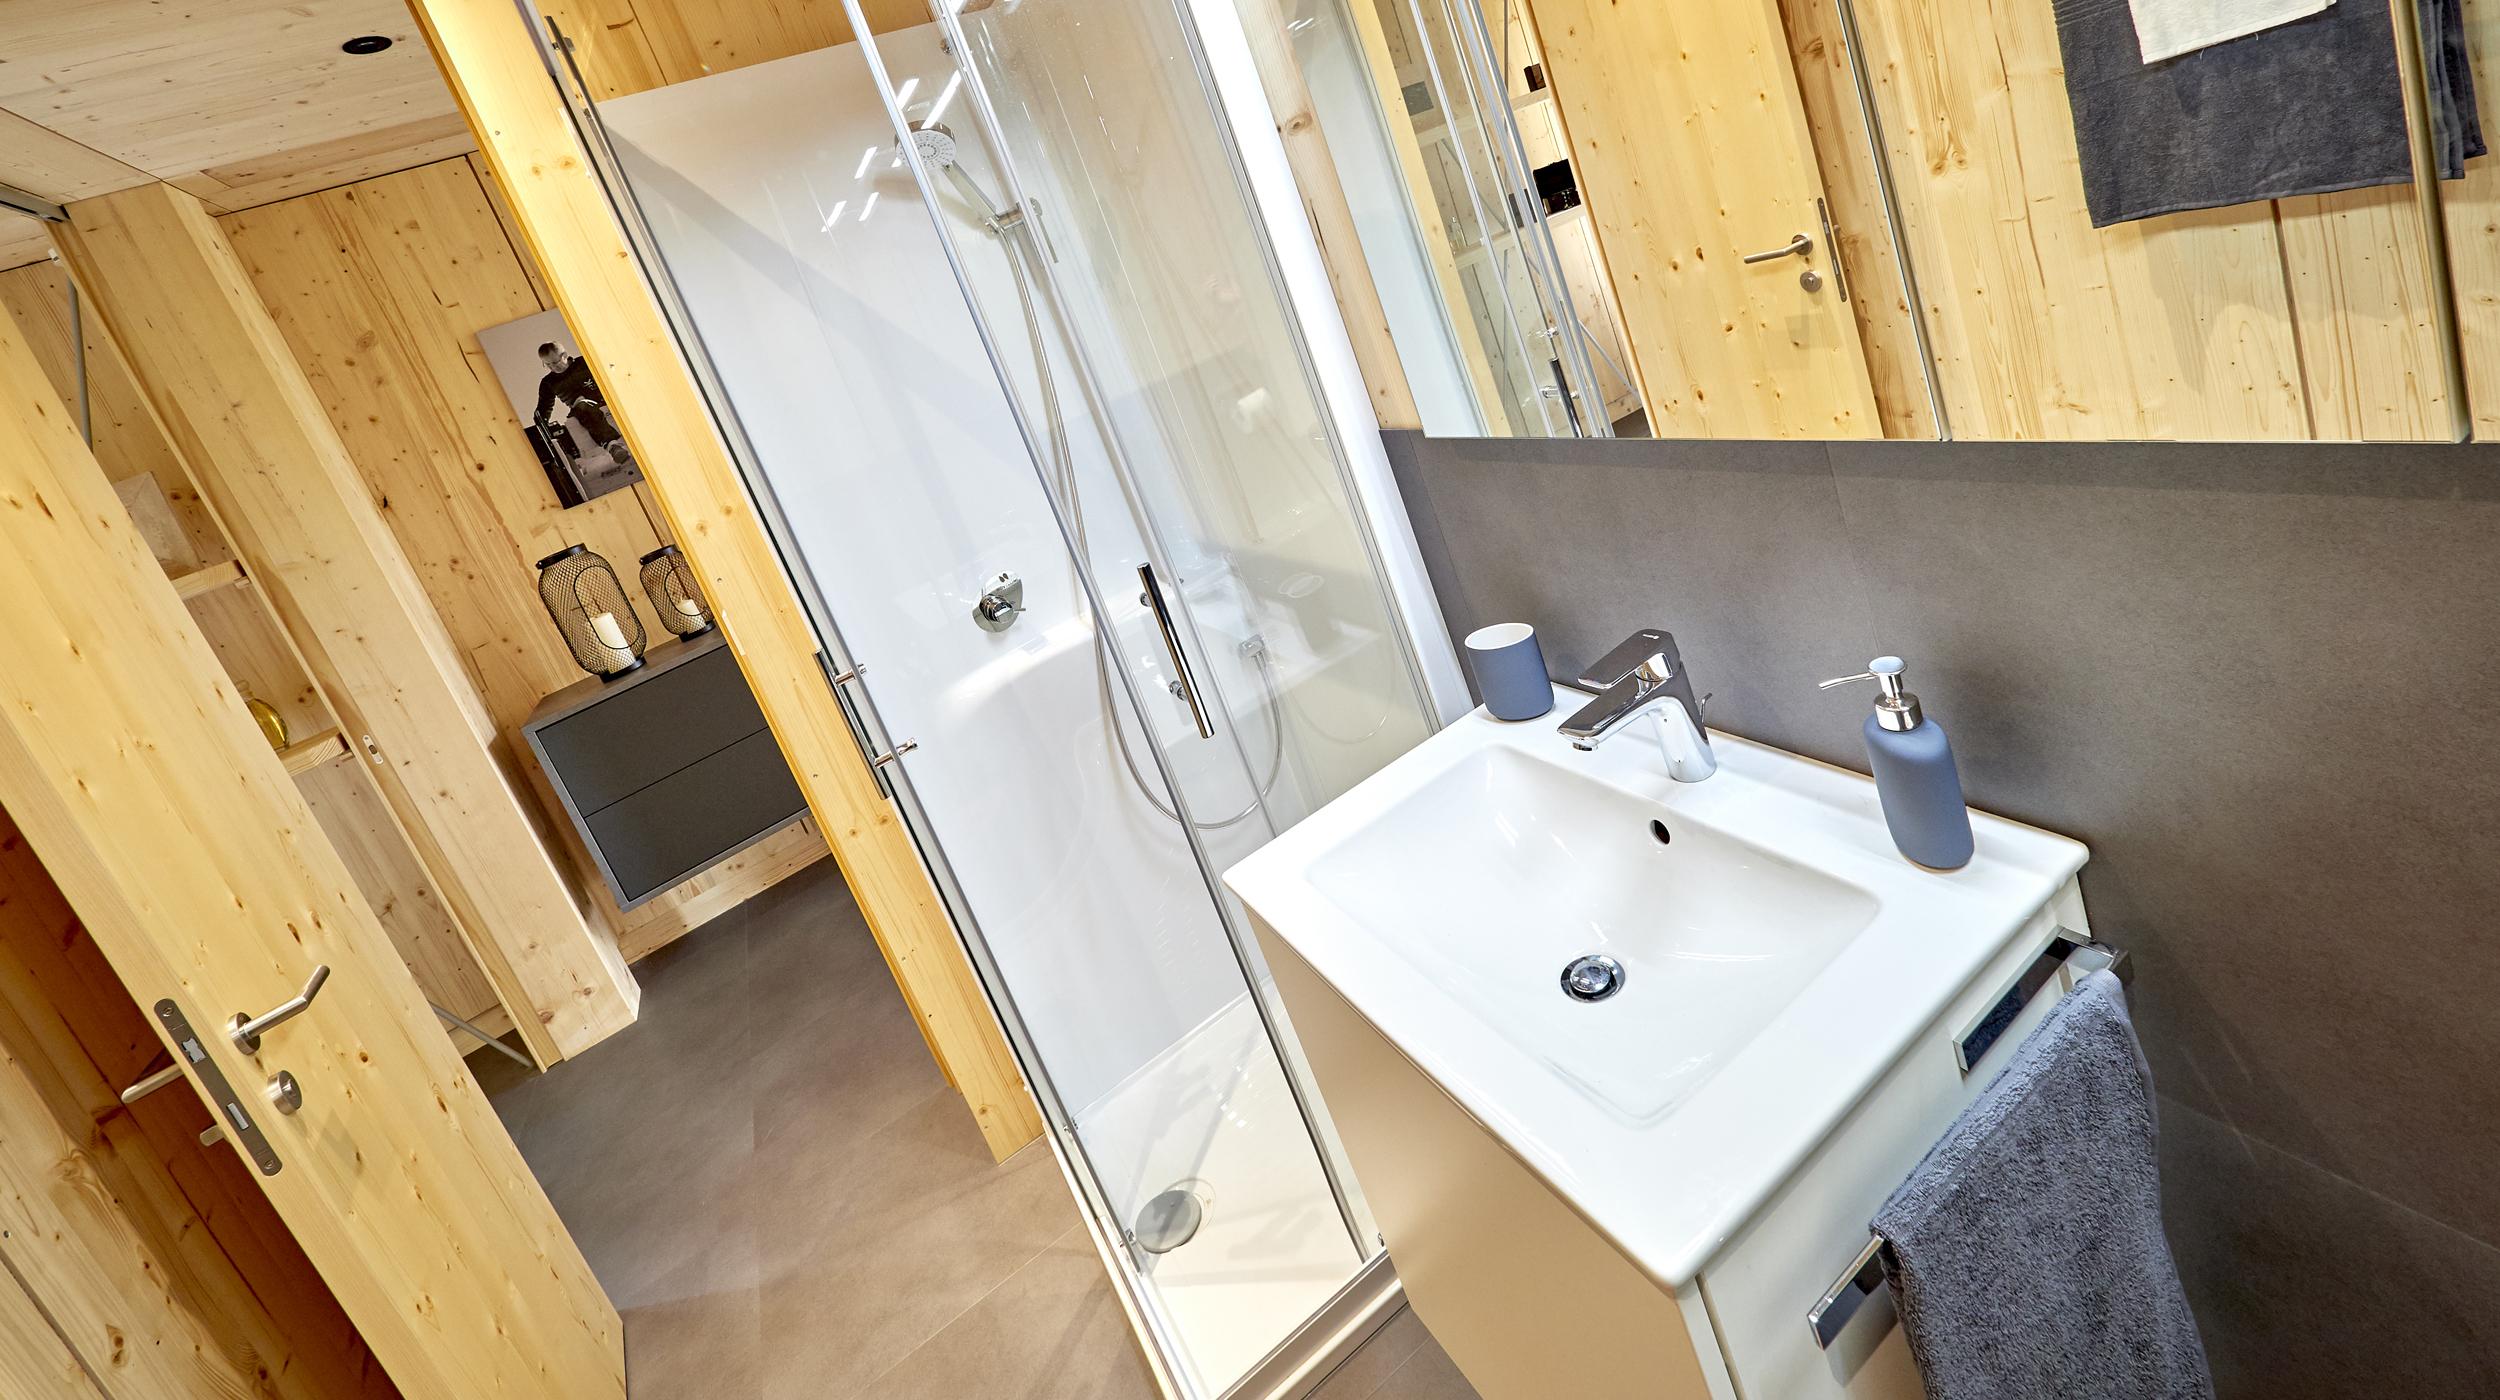 ZiKK 2.0 Musterhaus Vitis - Blick in das Badezimmer